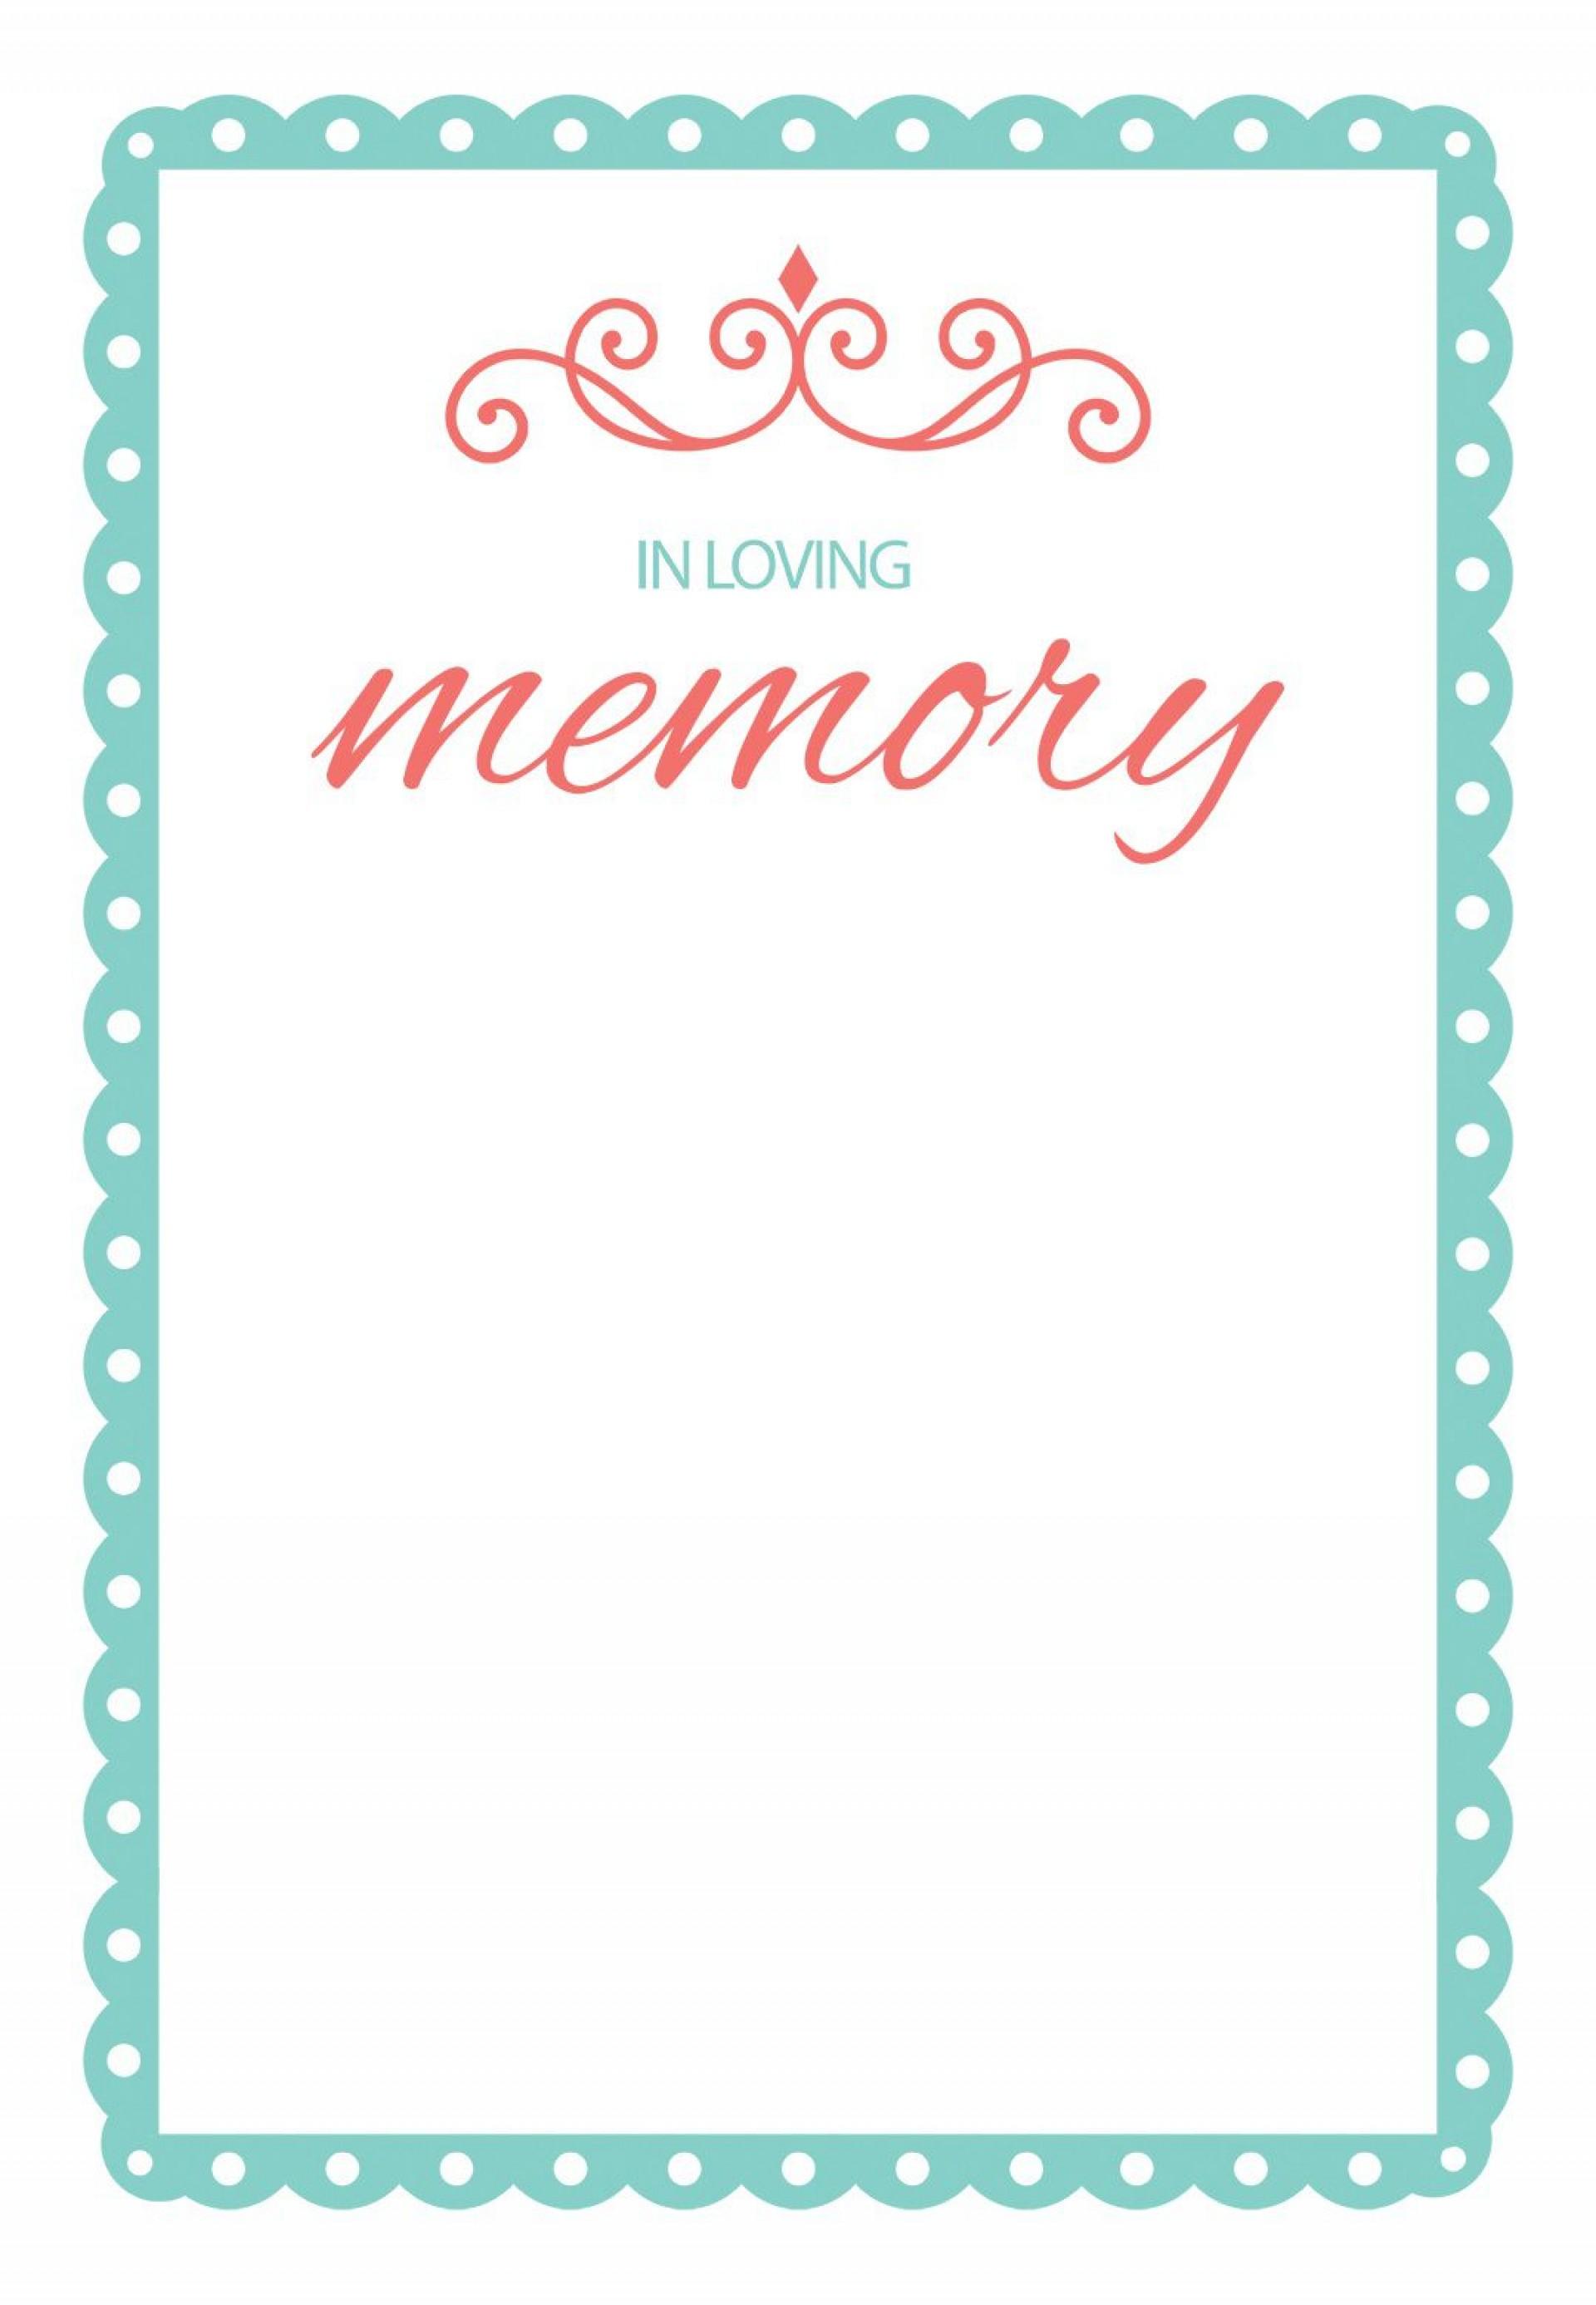 000 Impressive In Loving Memory Template Design  Free Download Card Bookmark1920